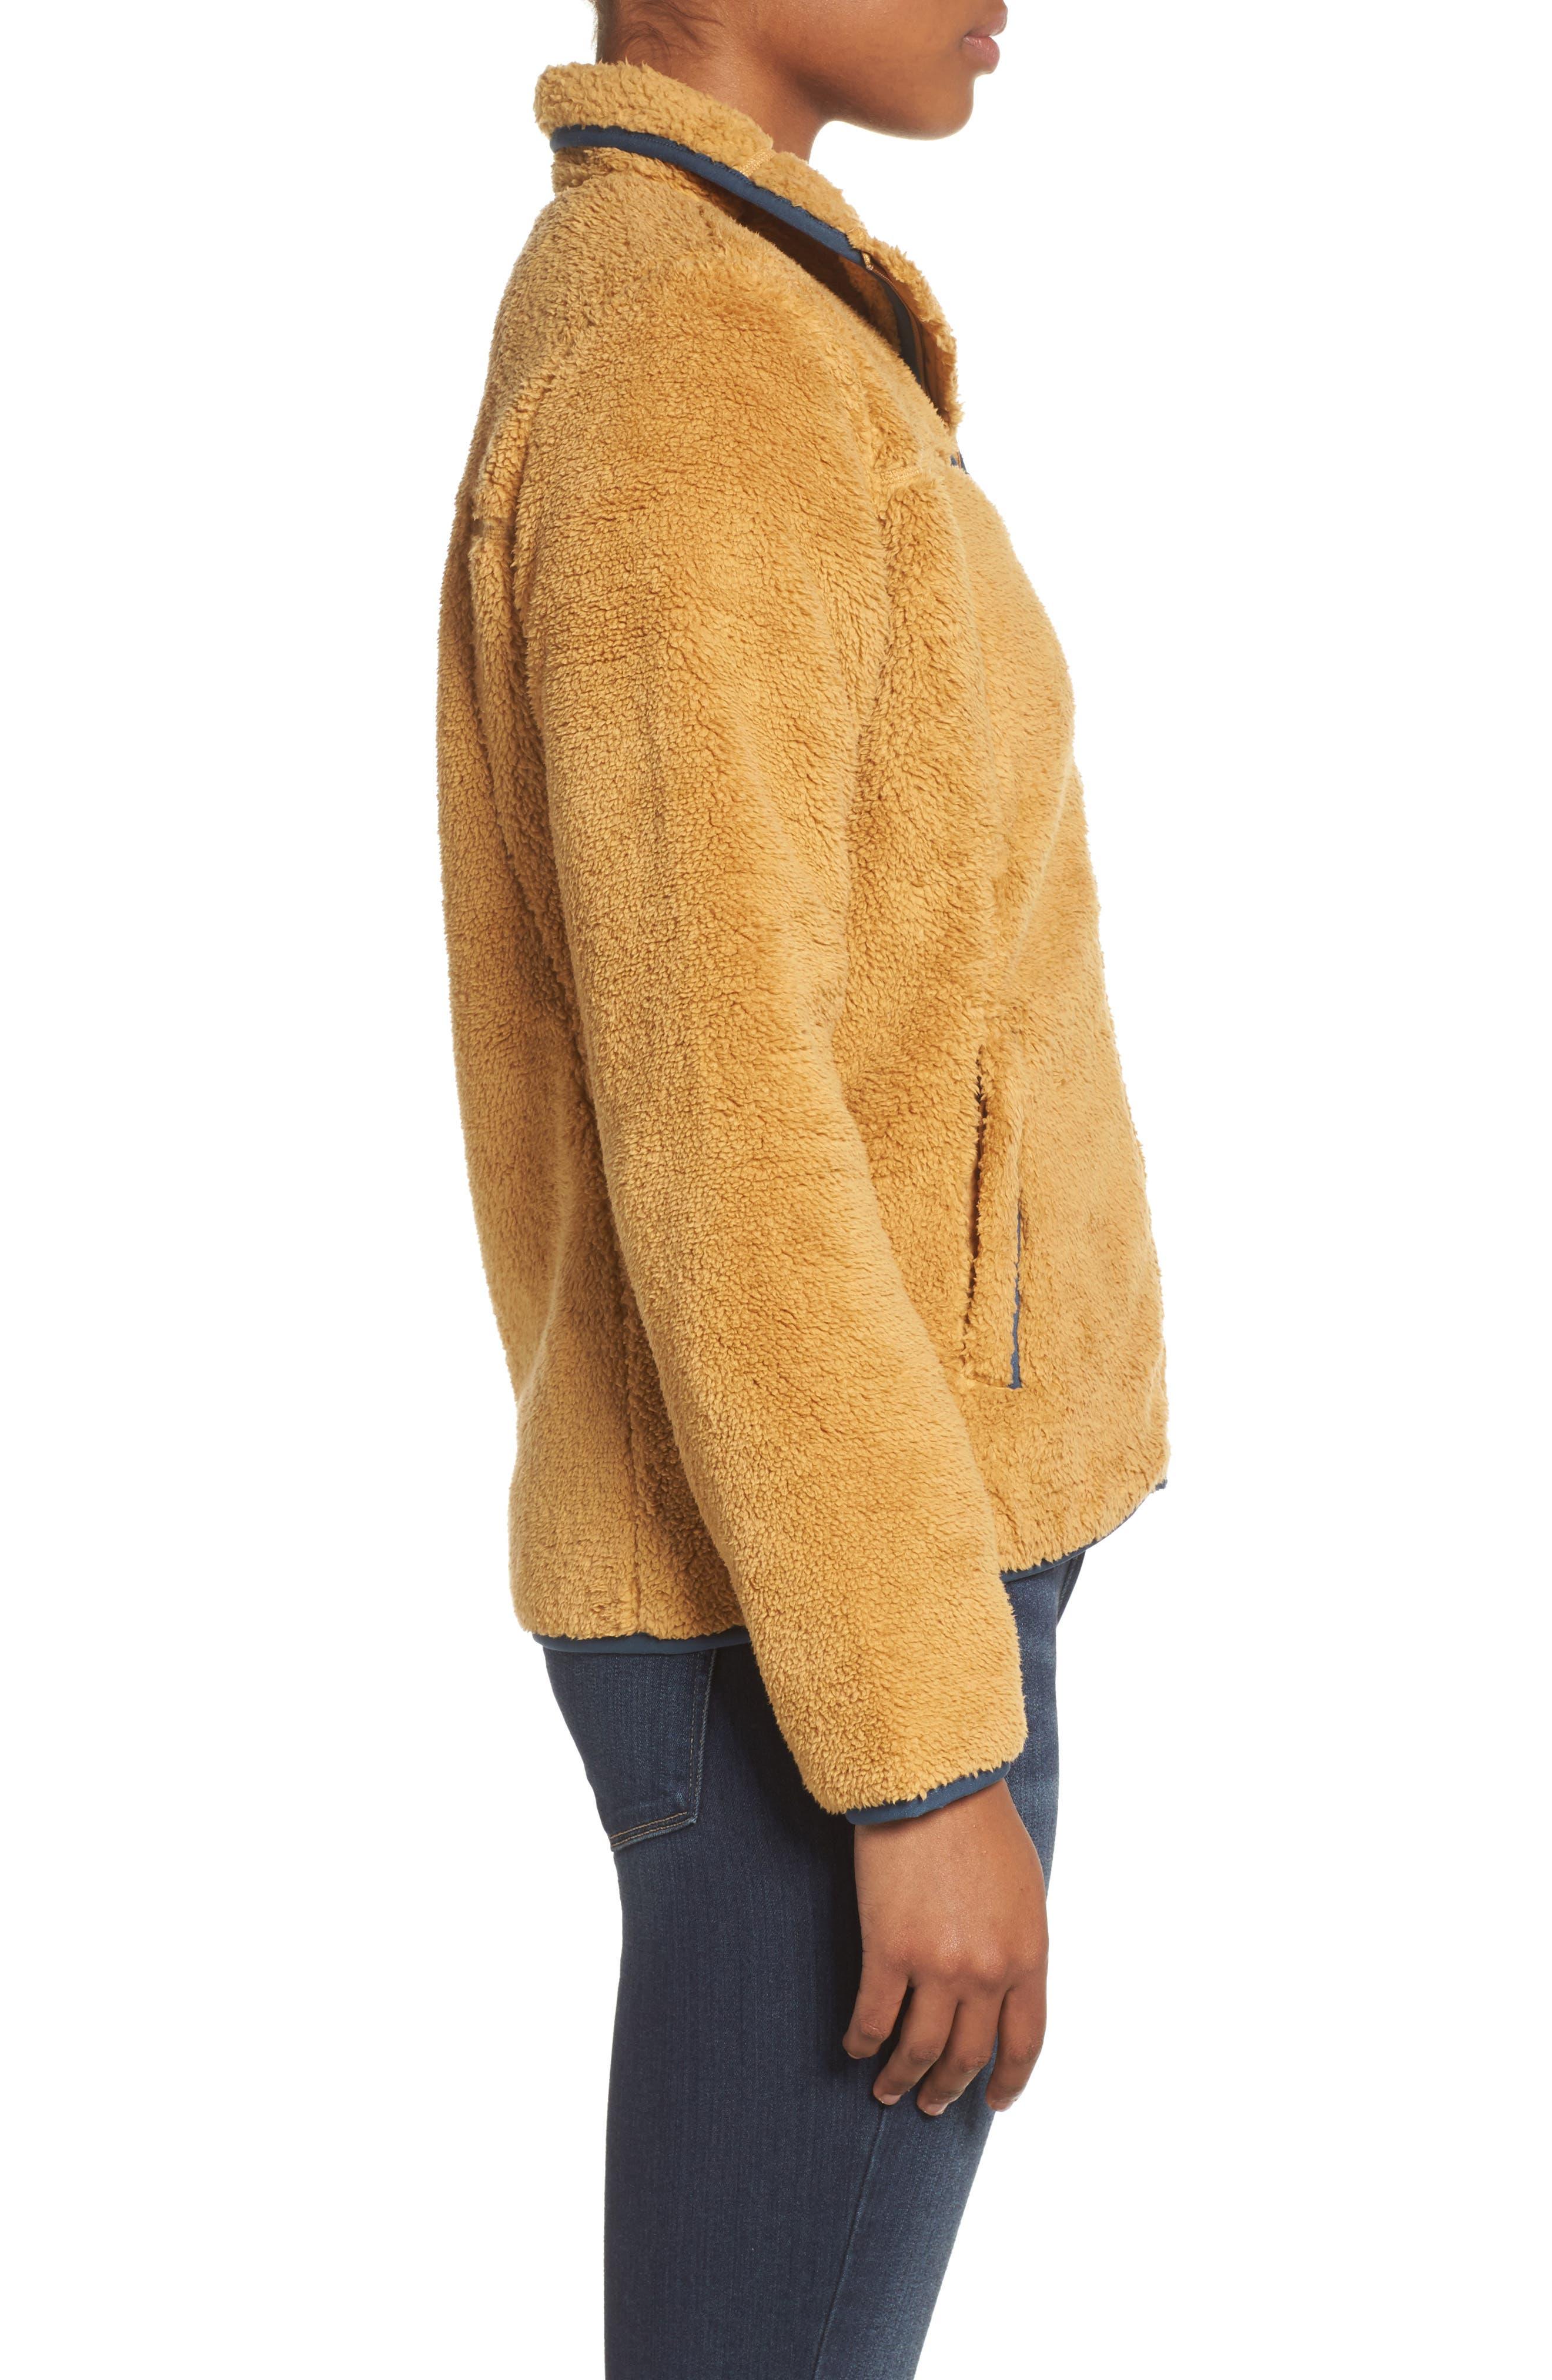 Campshire Zip Jacket,                             Alternate thumbnail 3, color,                             Biscuit Tan